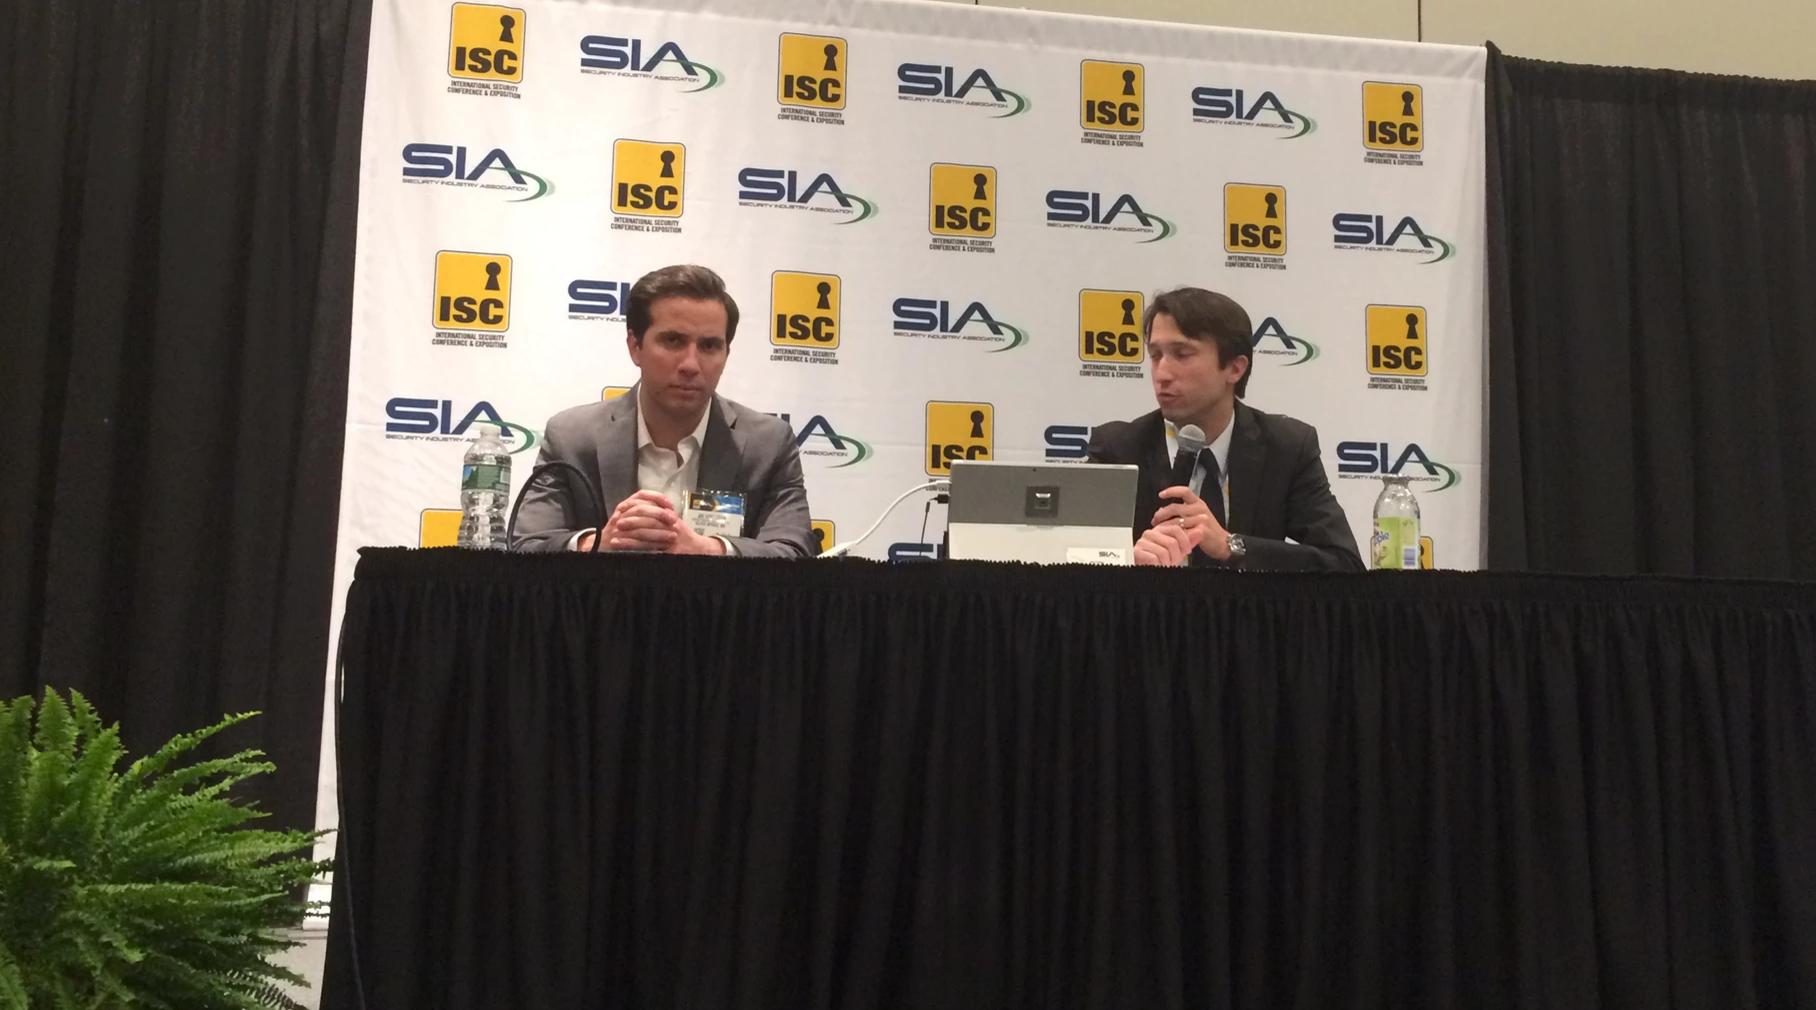 Joseph Hoellerer, left, and Jake Parker of the Security Industry Association speak at ISC East.